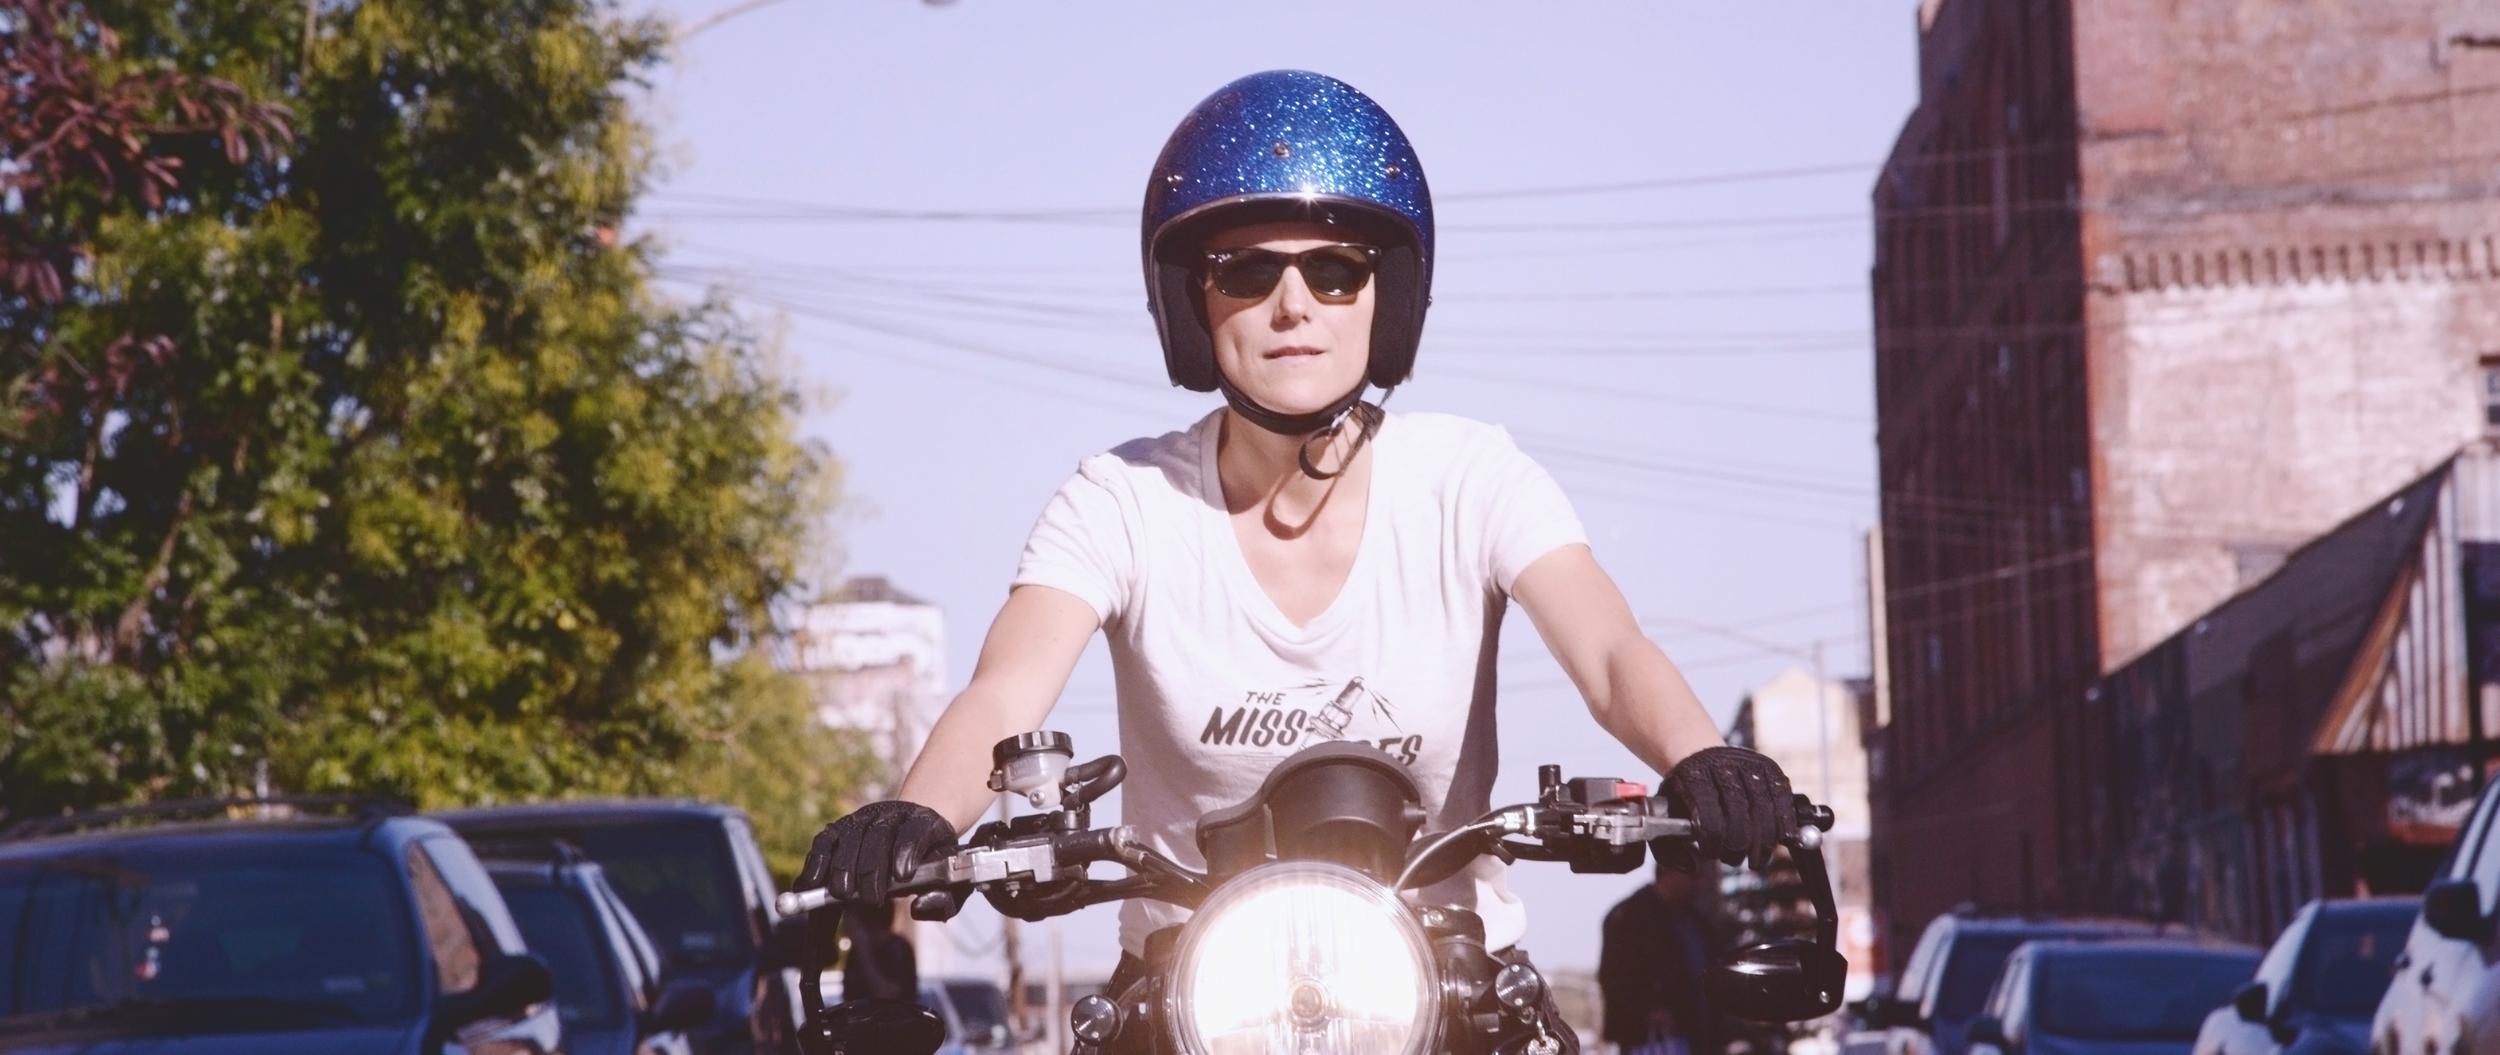 Stories_of_Bike_Discovery_2.jpg